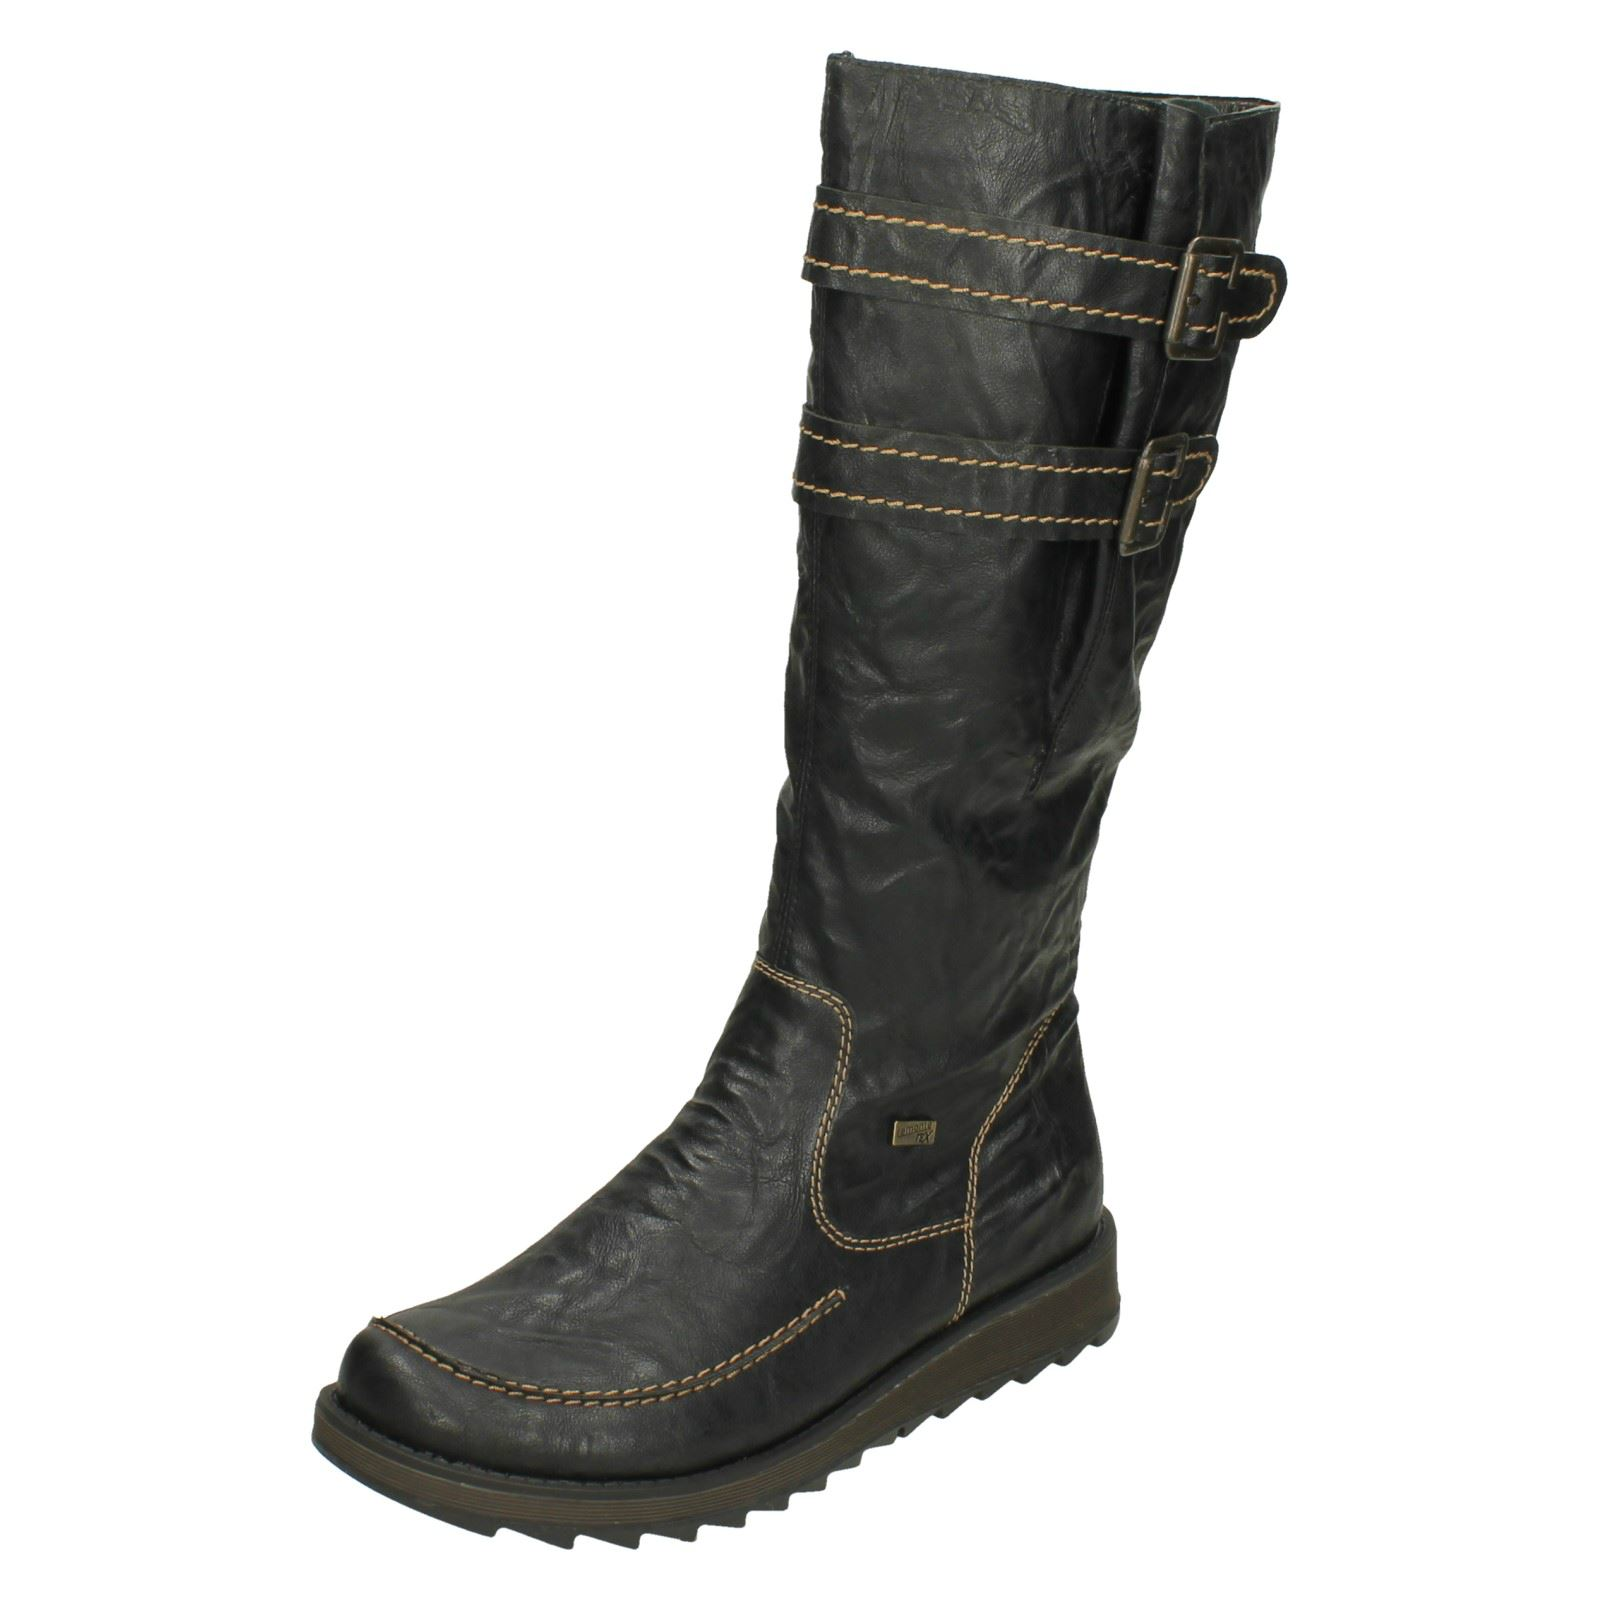 Ladies Remonte Stylish Stylish Stylish Knee High Boots D8884 8c8486